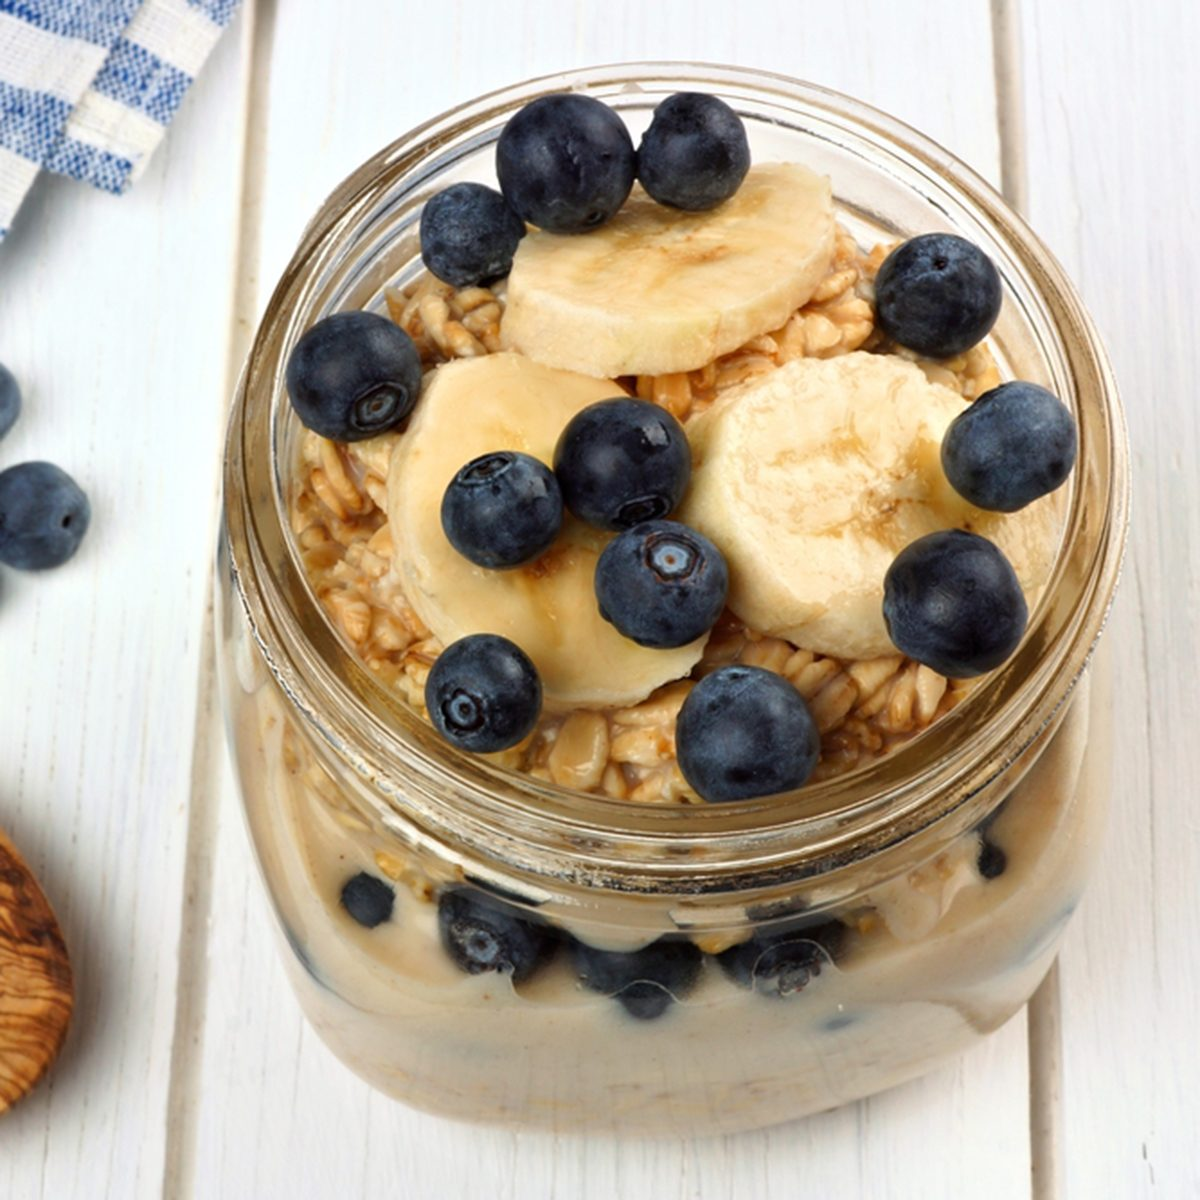 Blueberry and banana breakfast overnight oatmeal in a mason jar